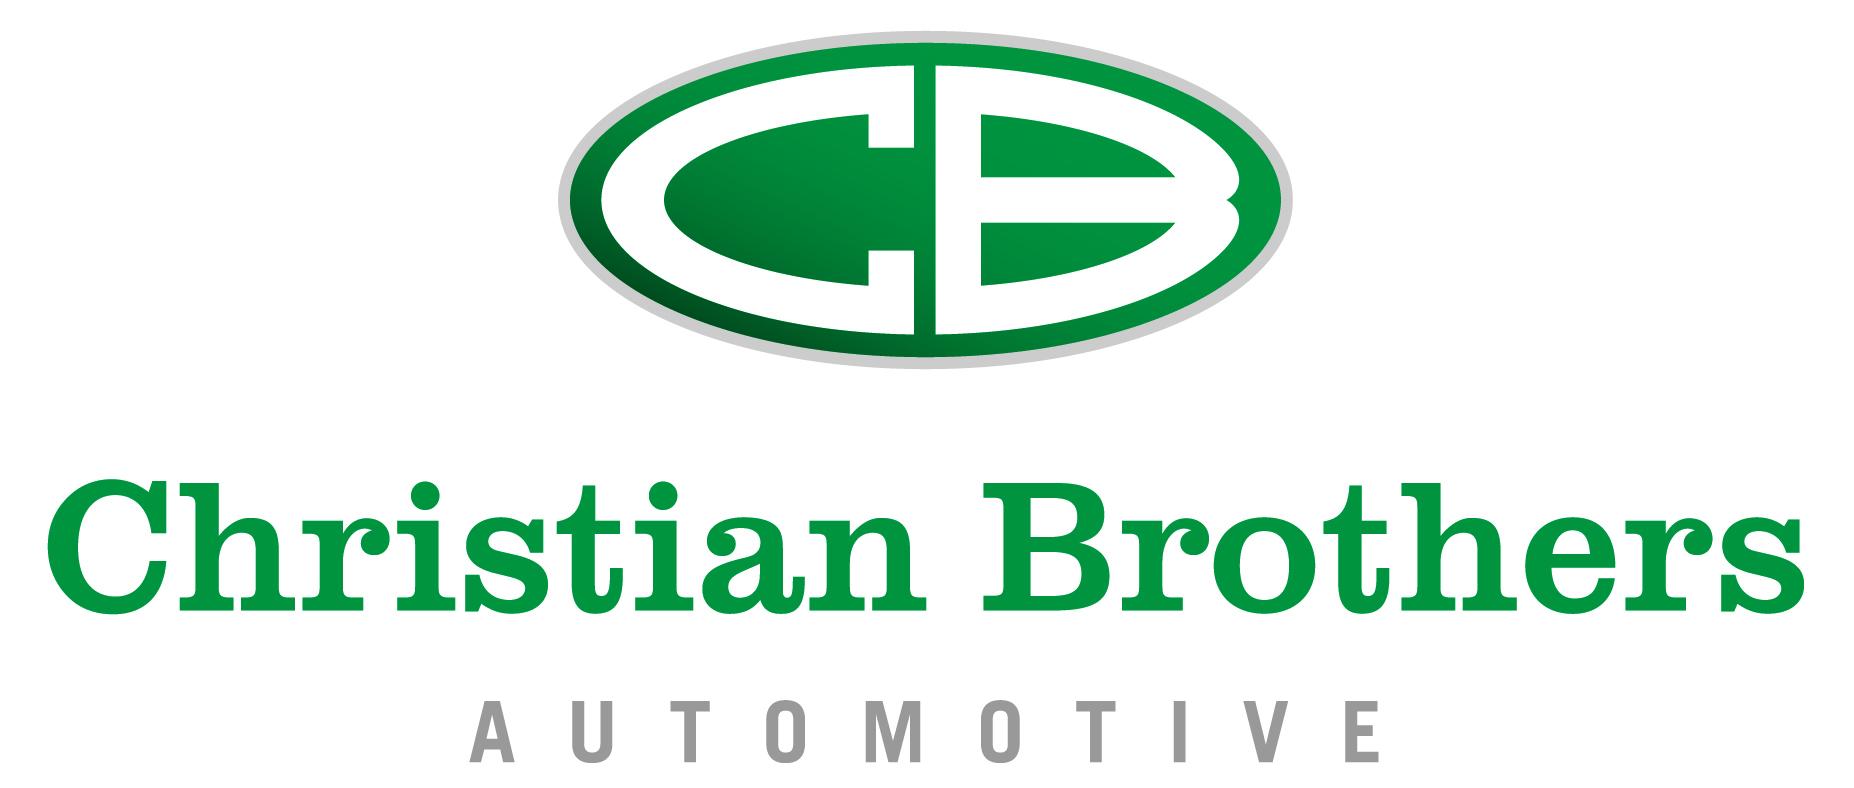 Christian Brothers Automotive Vista Ridge